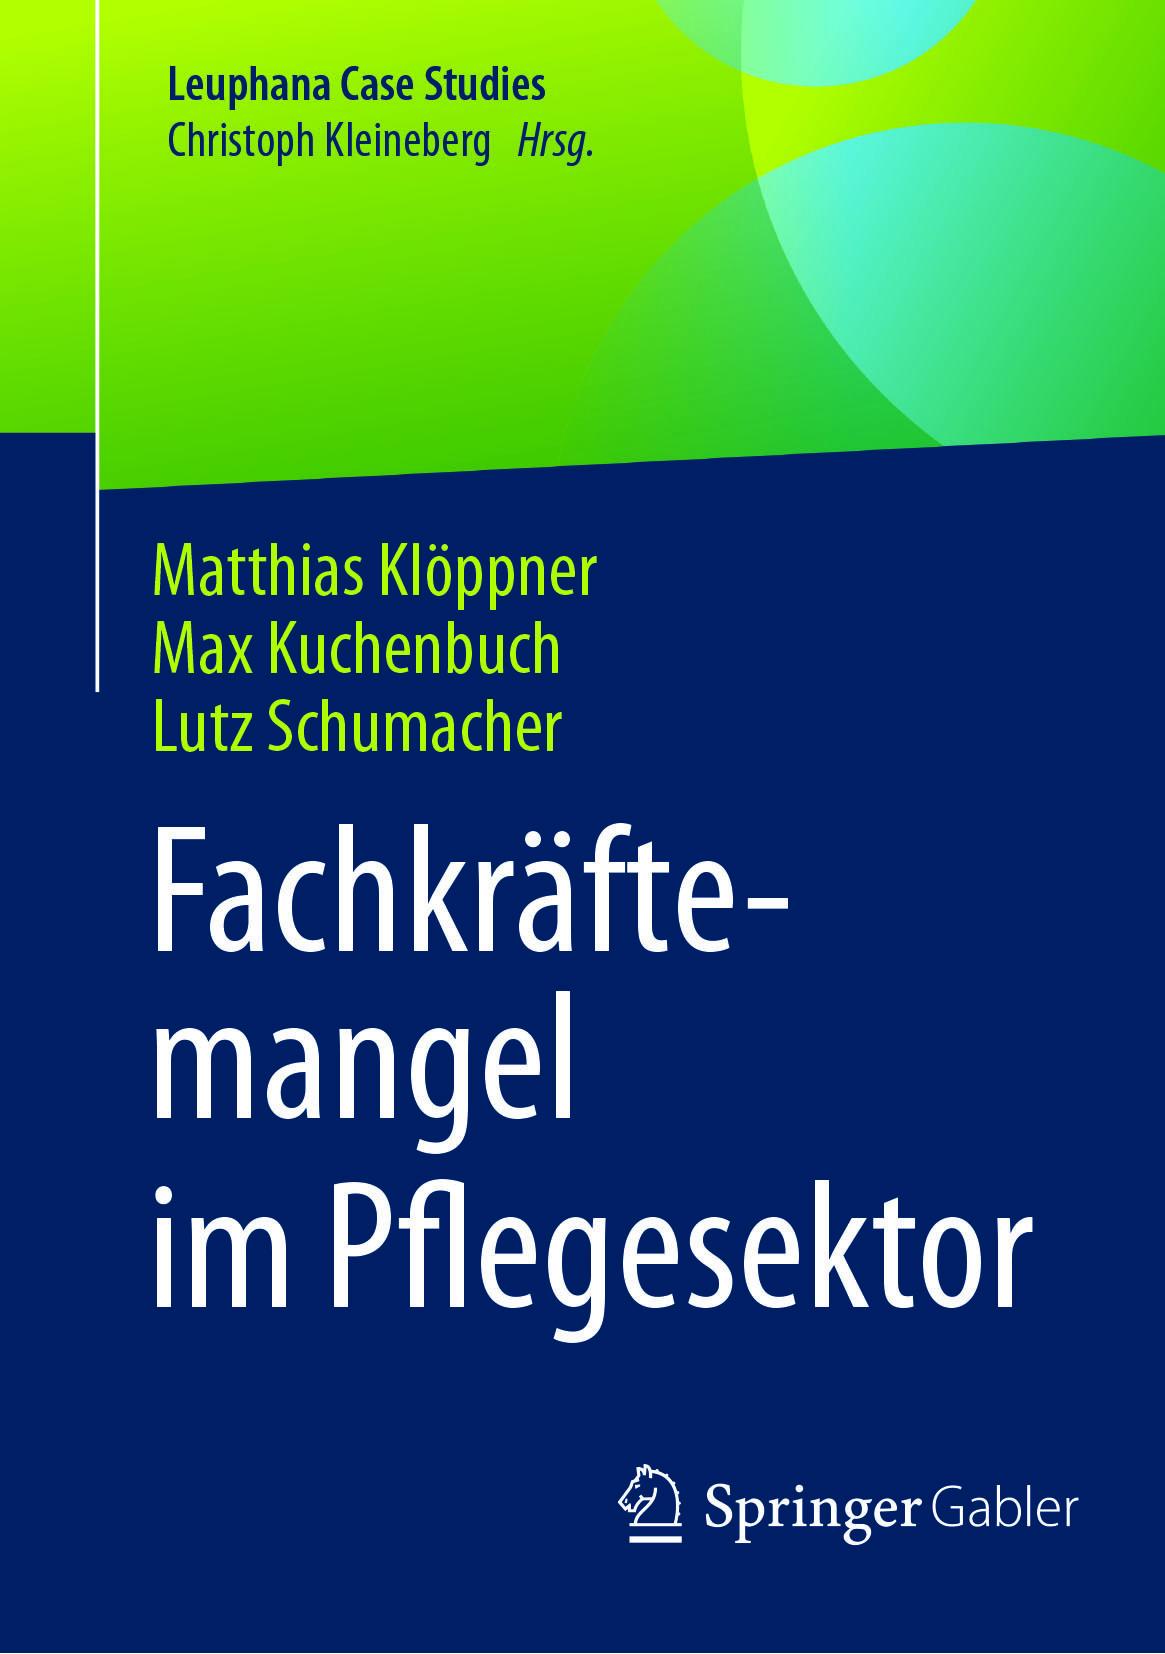 Klöppner, Matthias - Fachkräftemangel im Pflegesektor, ebook